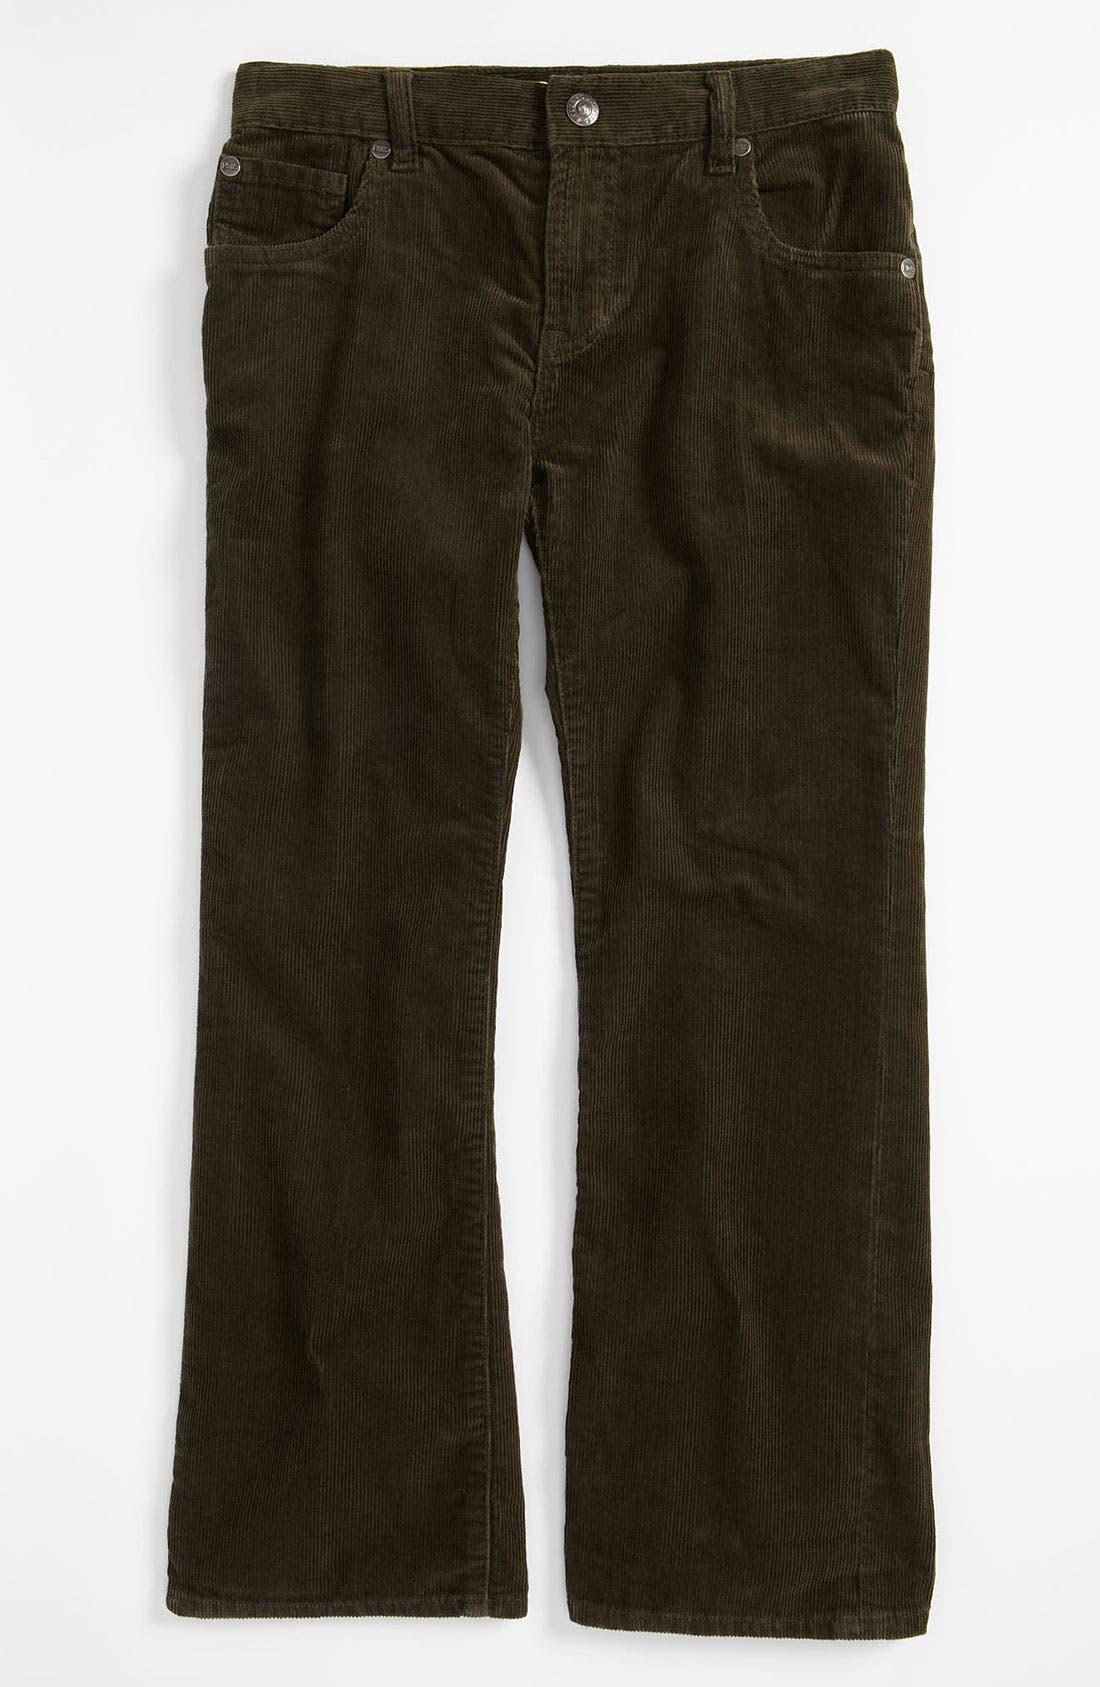 Main Image - Peek 'Sullivan' Corduroy Jeans (Toddler, Little Boys & Big Boys)